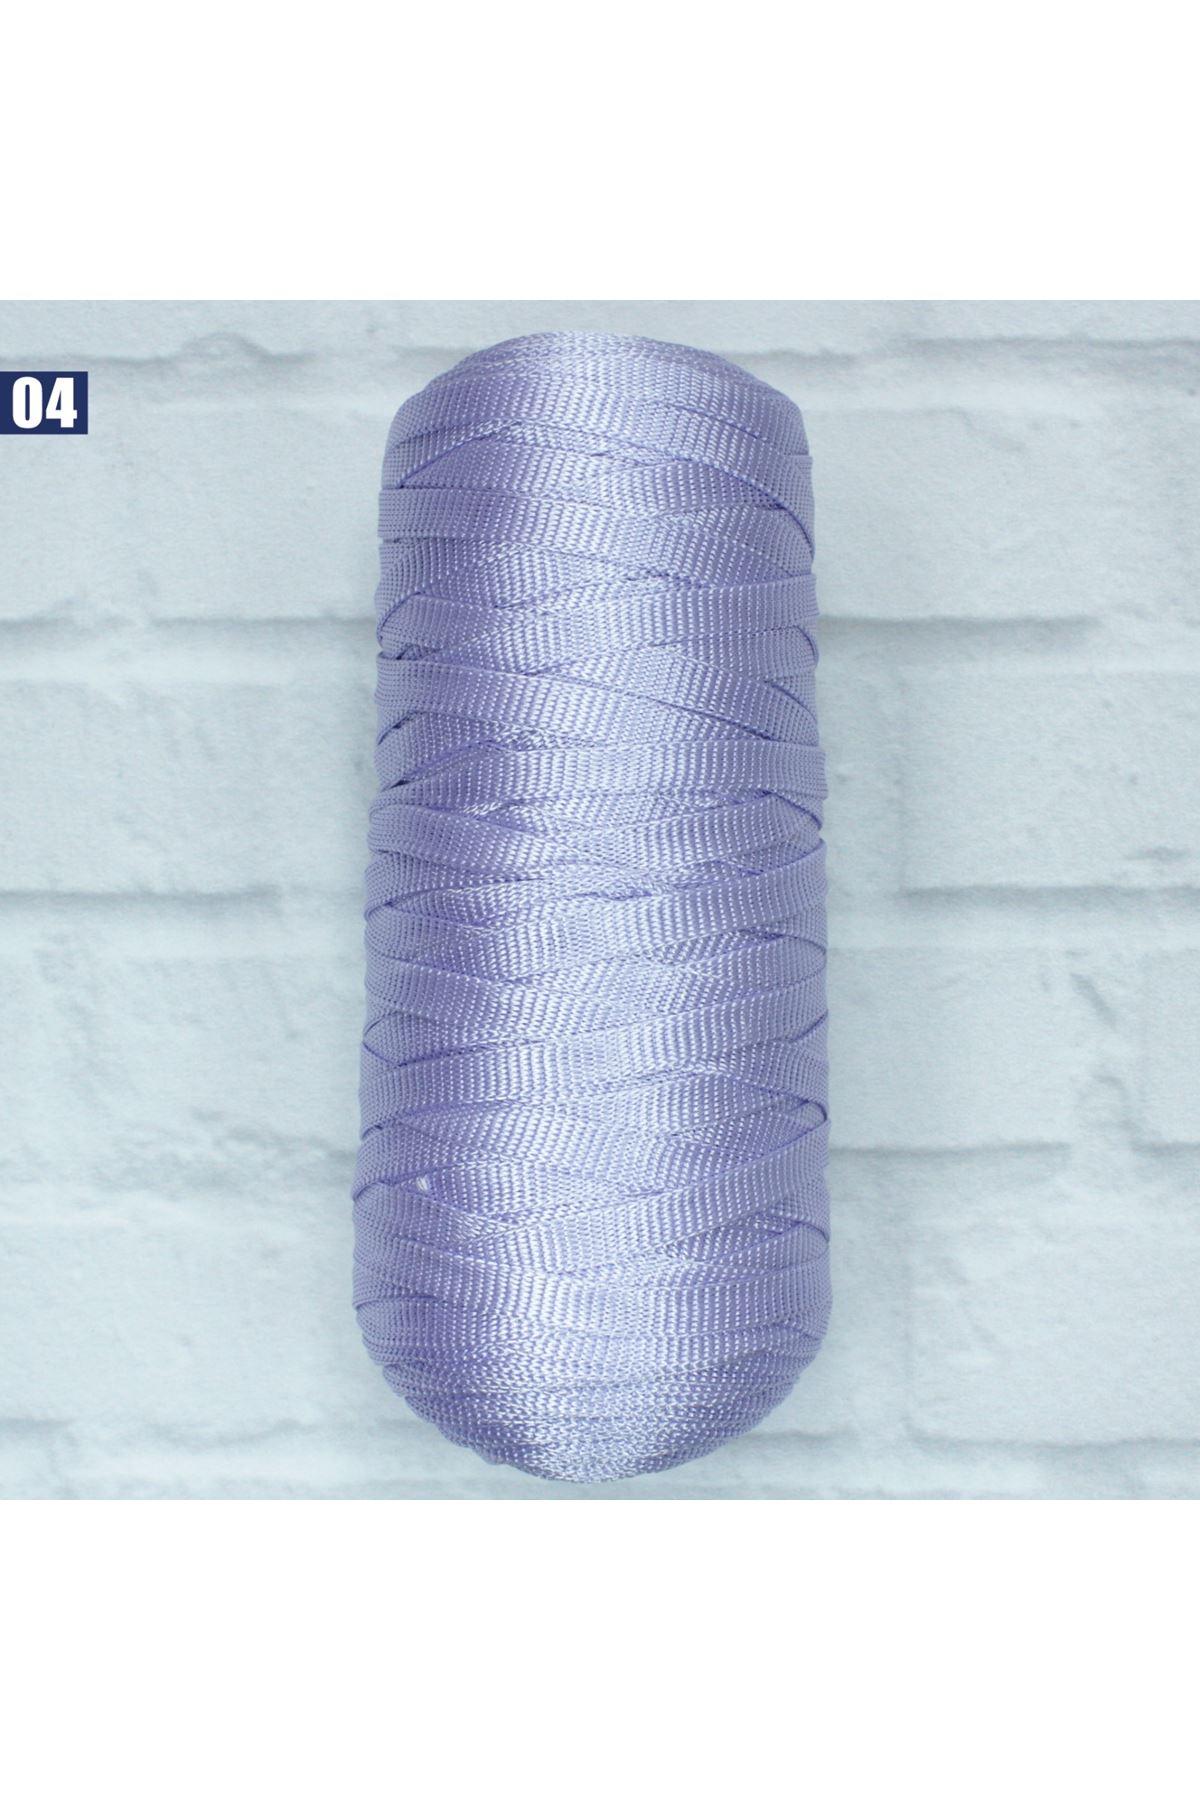 Polyester Ribbon 04